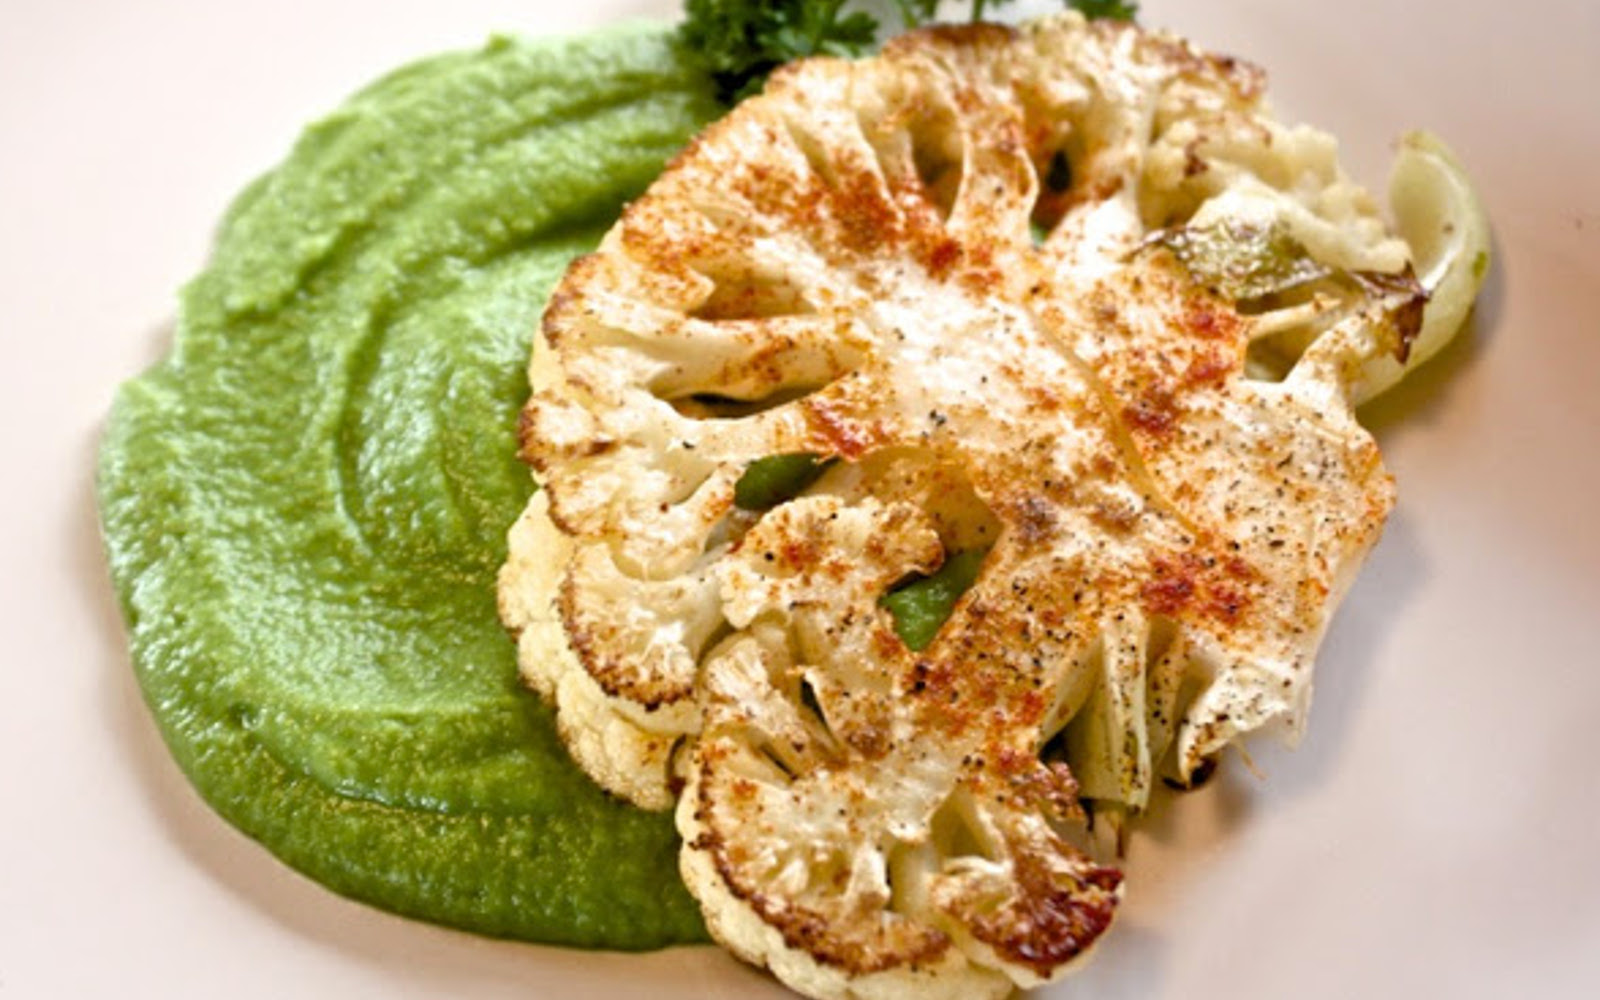 cauliflower steaks with sweet pea puree